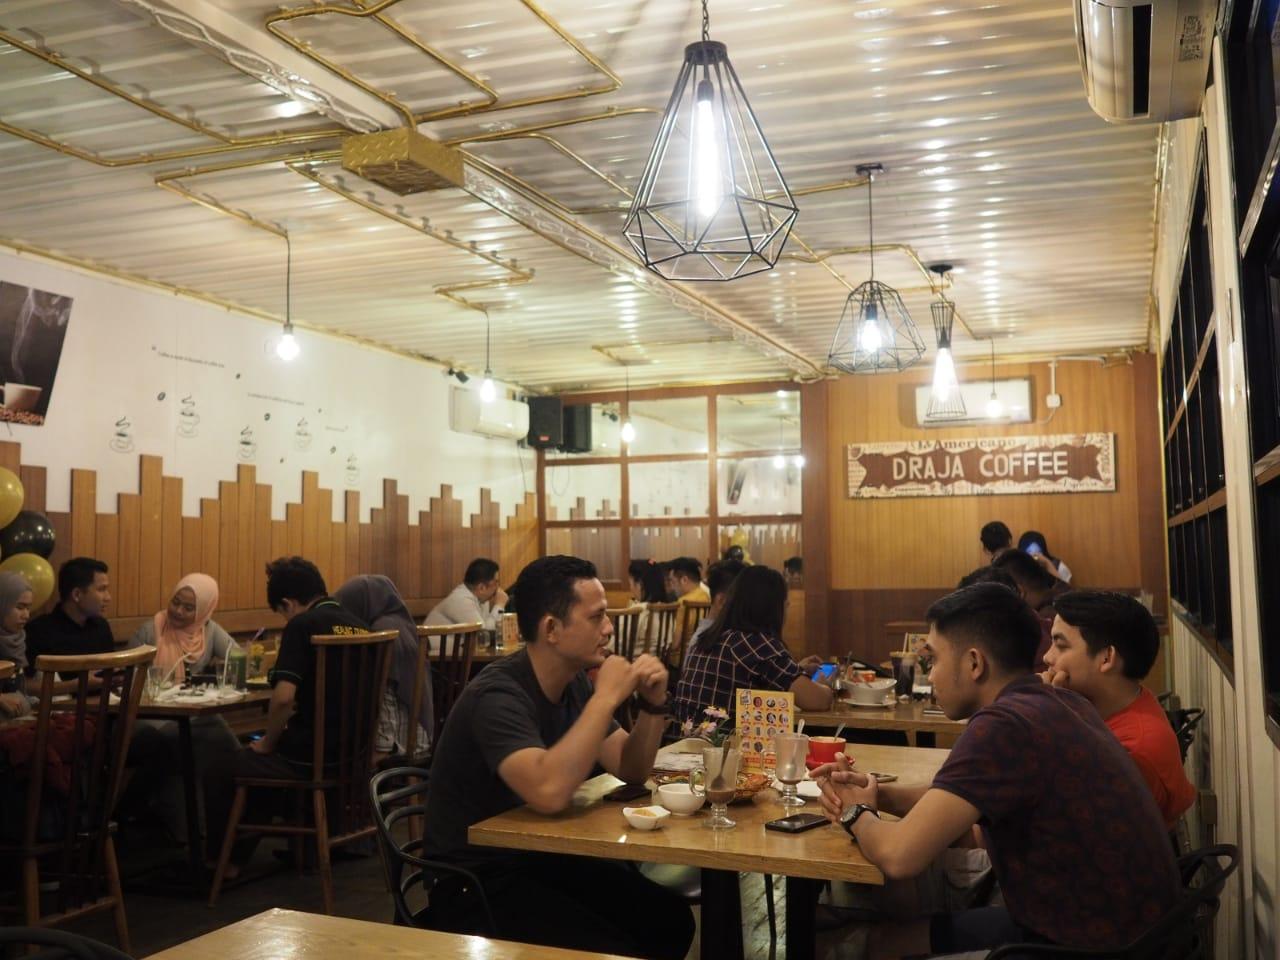 D'Raja Coffee Medan